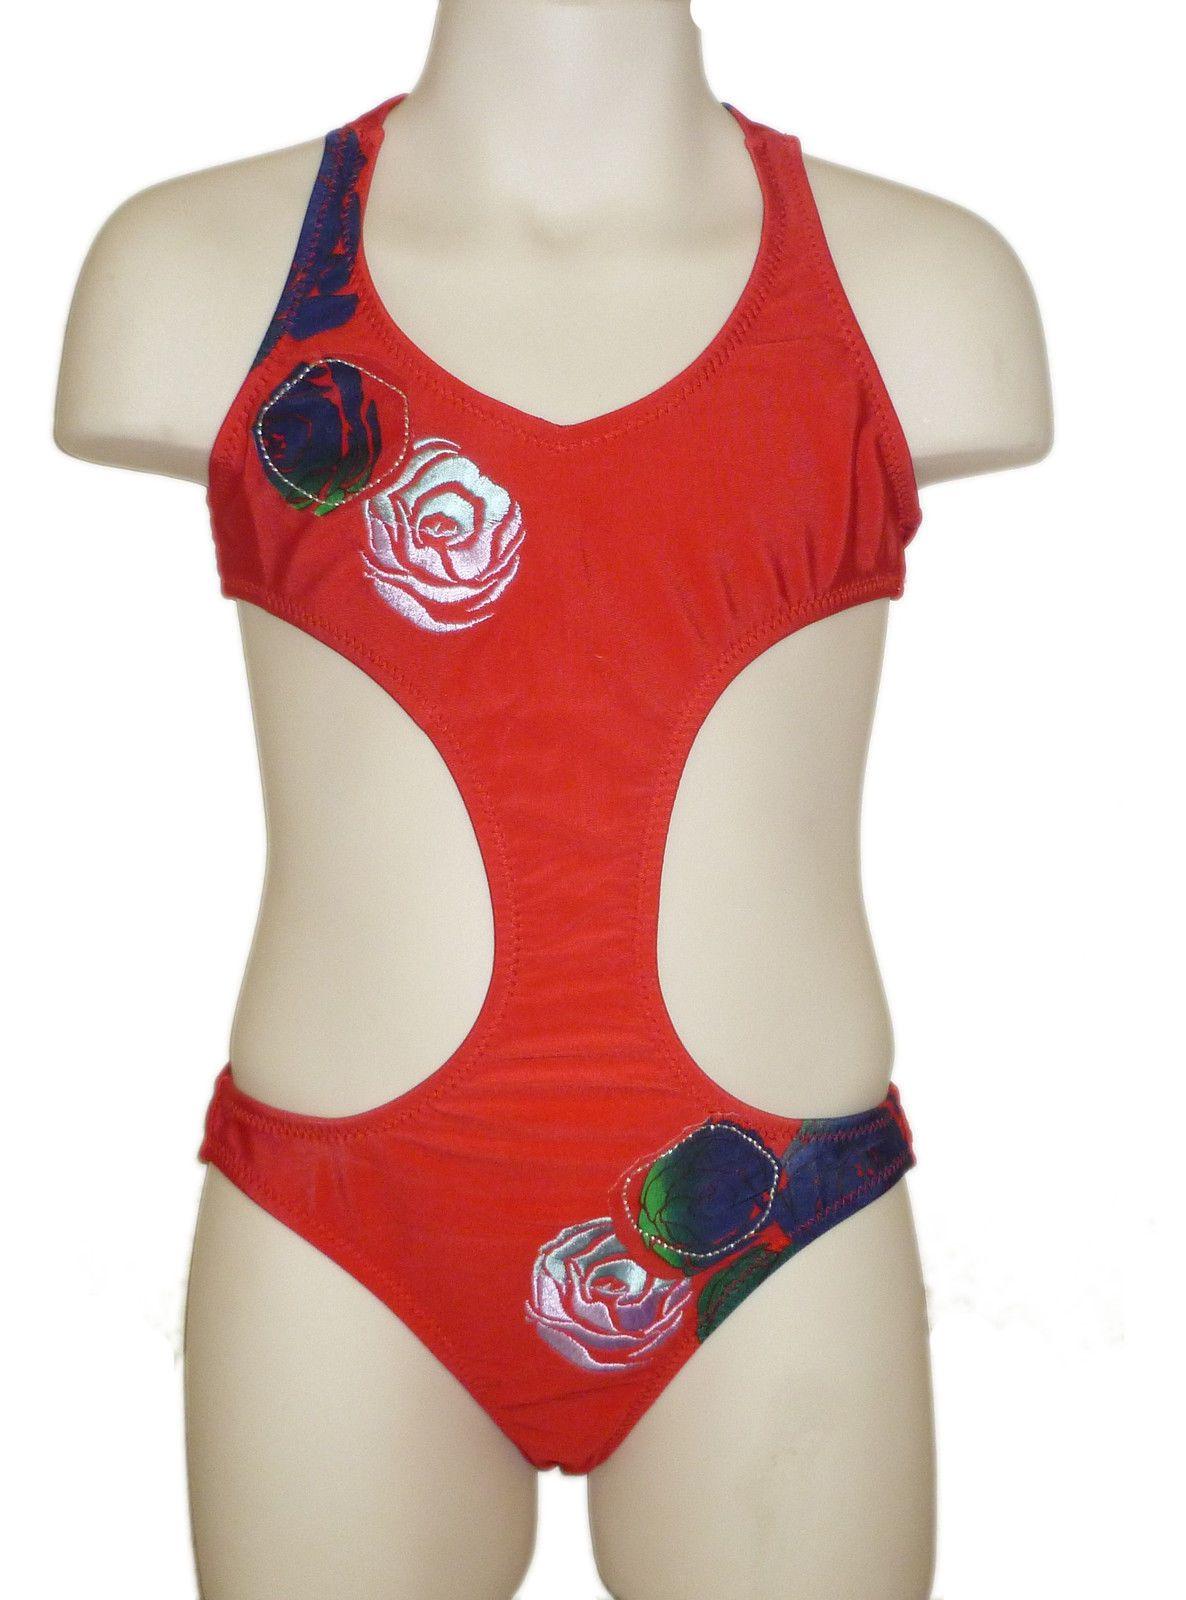 Freebily Kids Junior Girls Two Piece Skirted Swimsuits Striped Tankini Set Swimming Costume Swim Dress